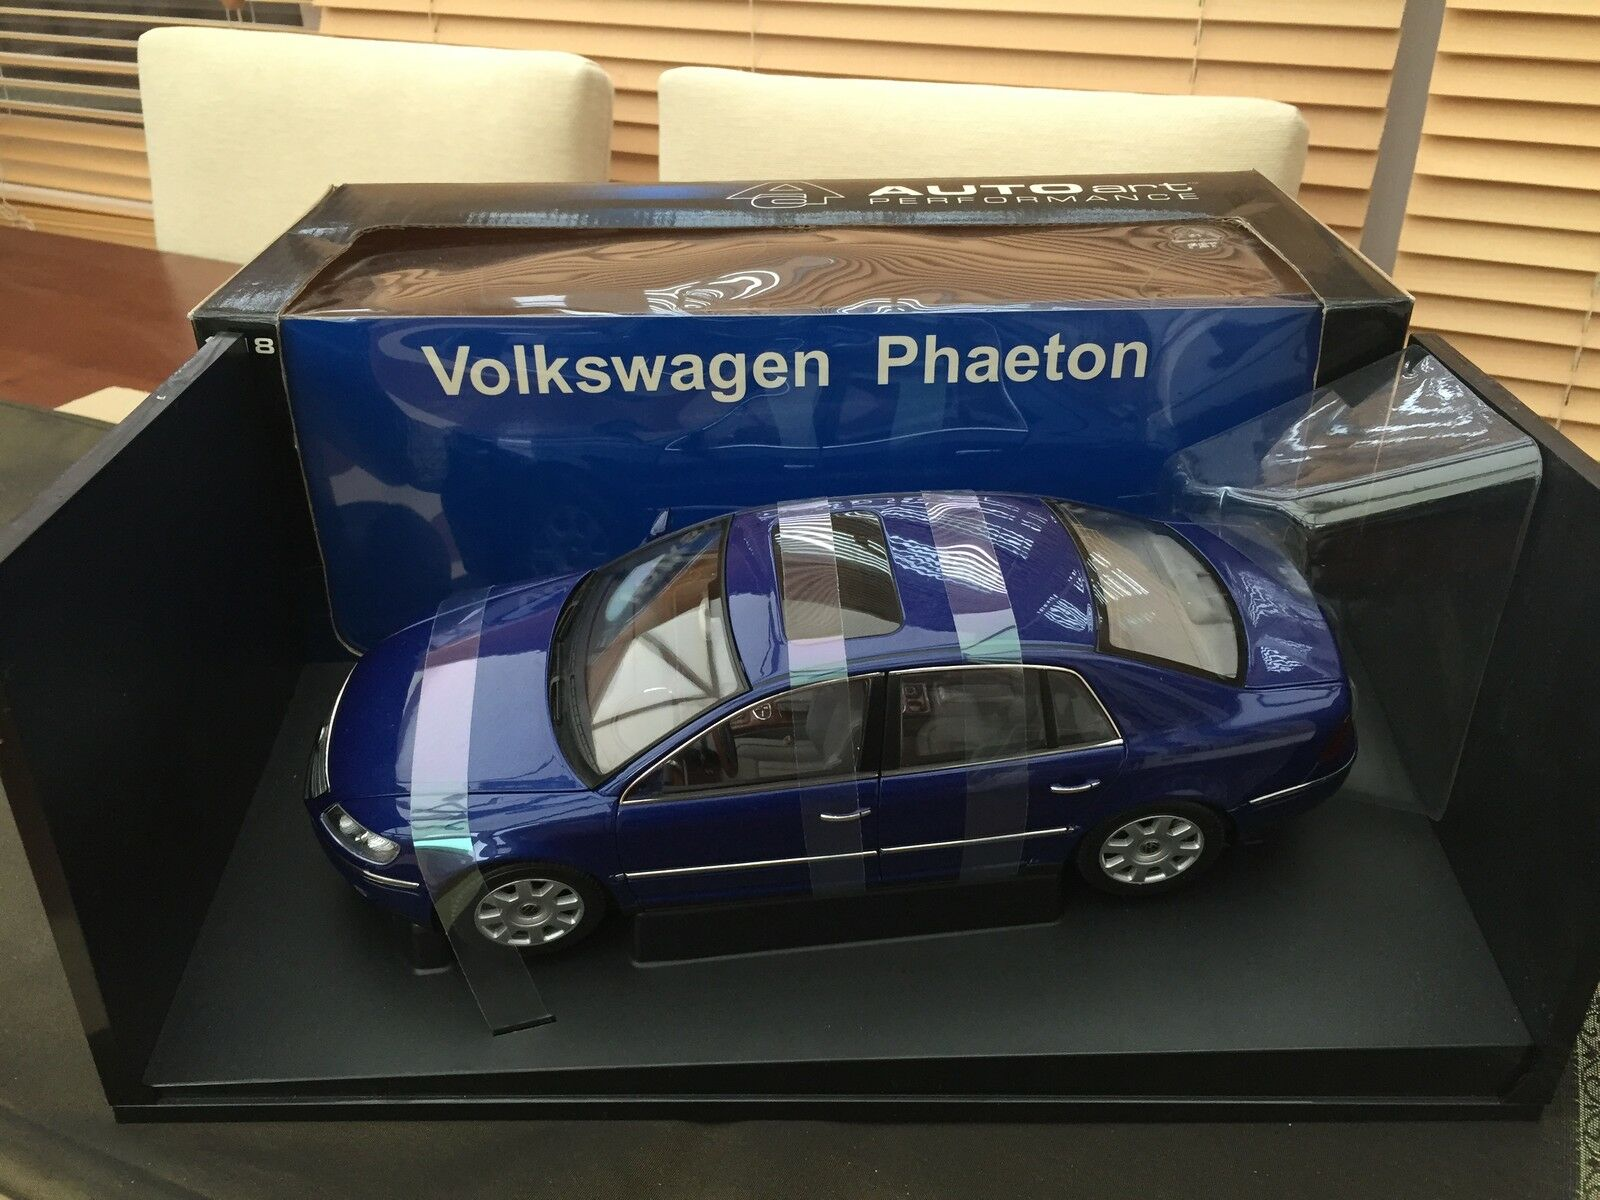 Autoart 1 18 Volkswagon Phaeton in splendida perla azul MOLTO RARO